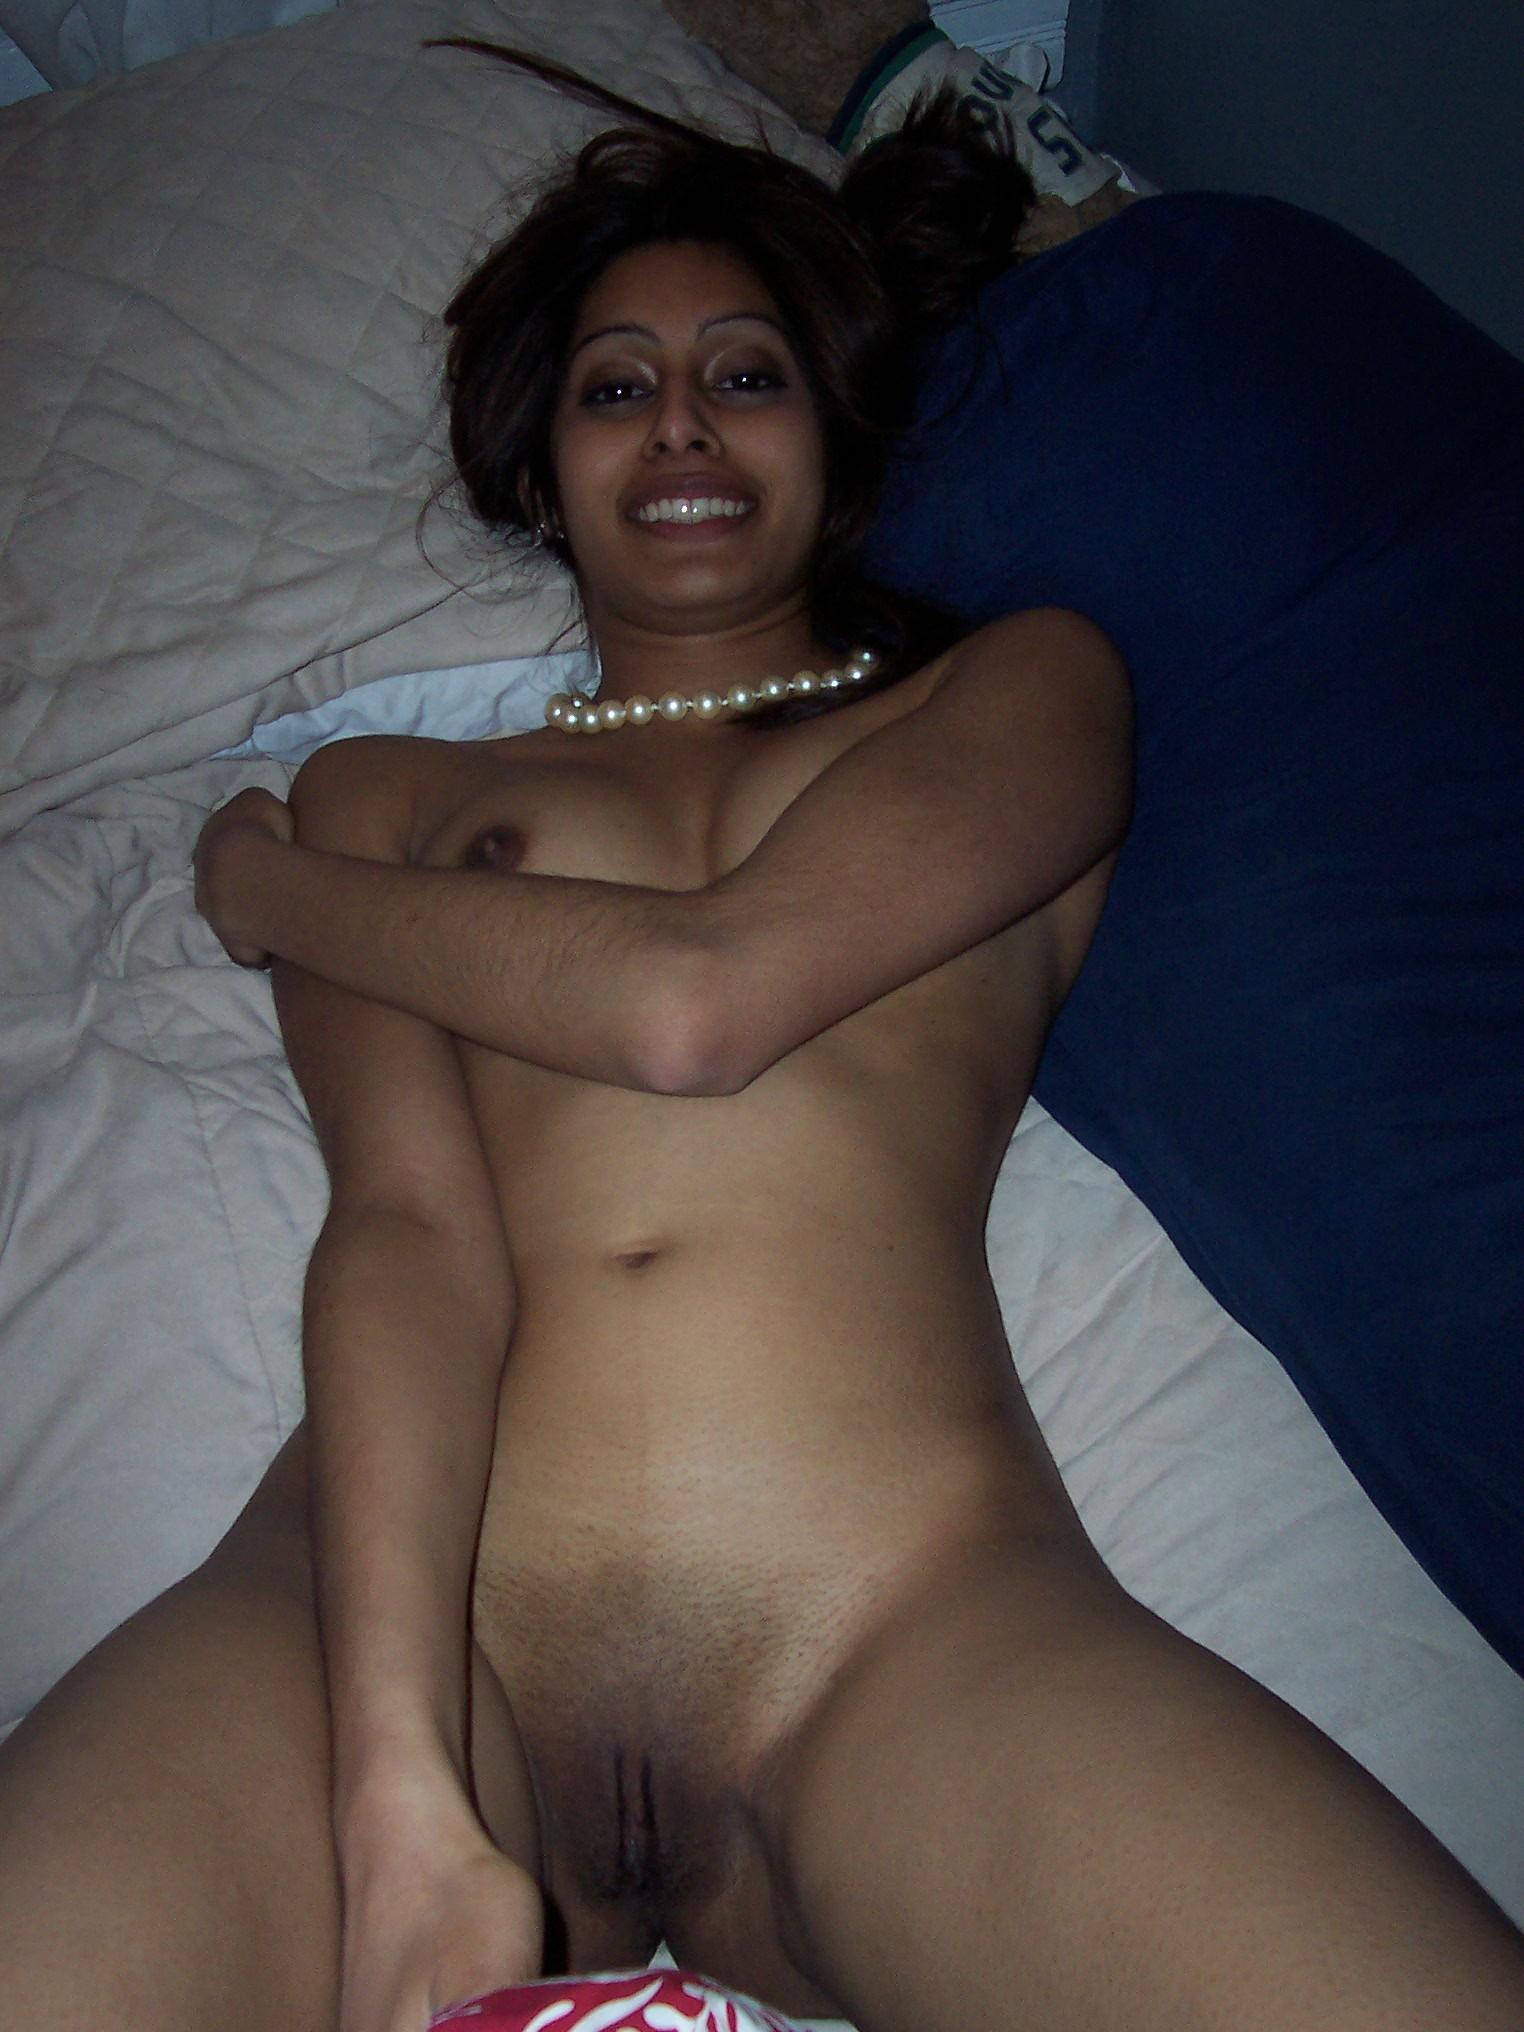 Naked blooper